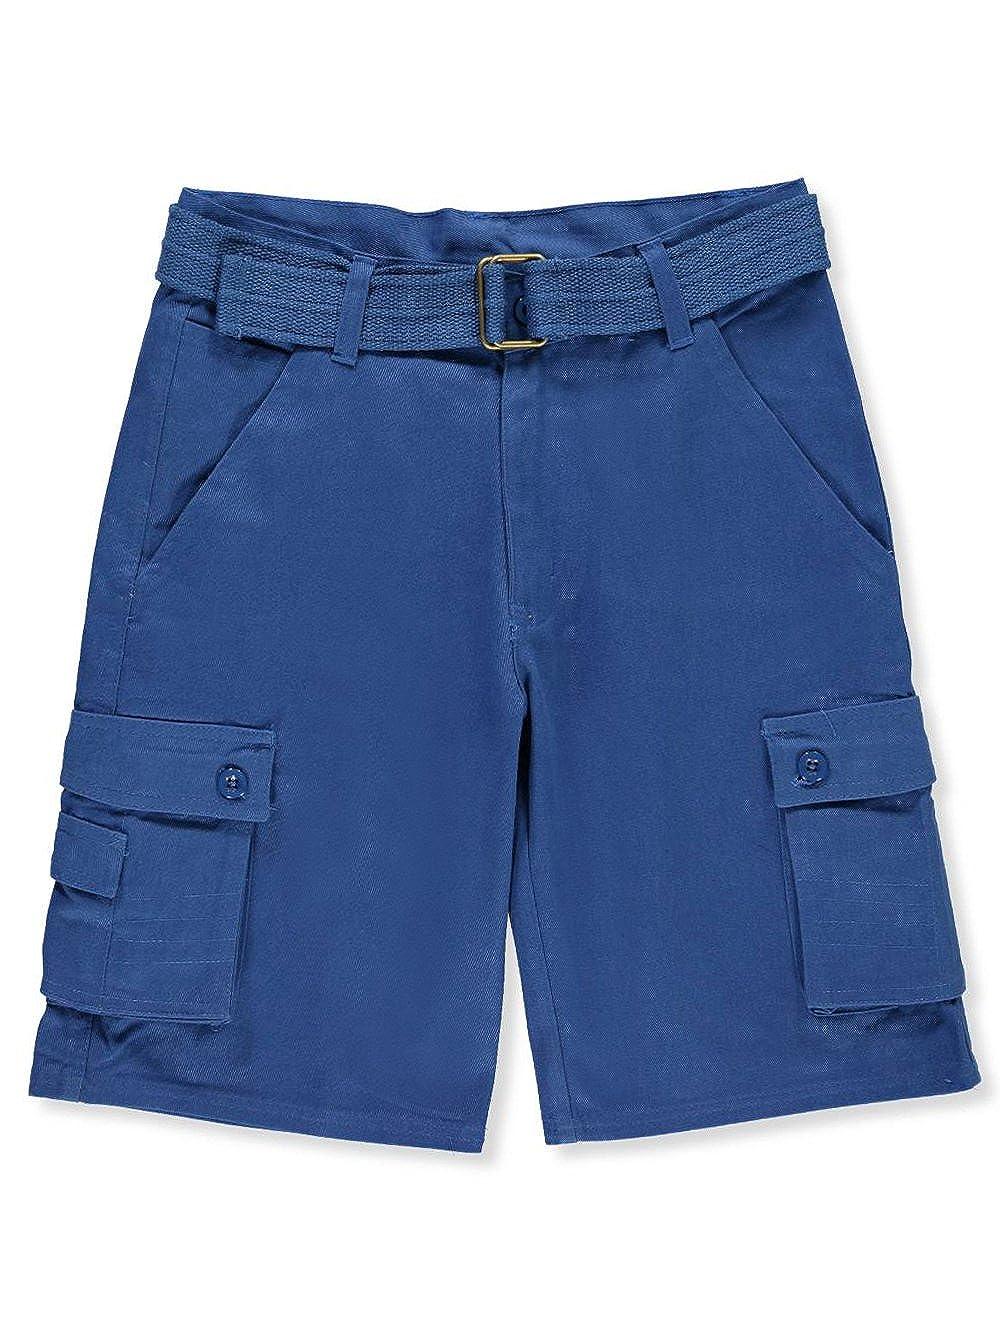 Quad Seven Boys' Belted Cargo Shorts 12